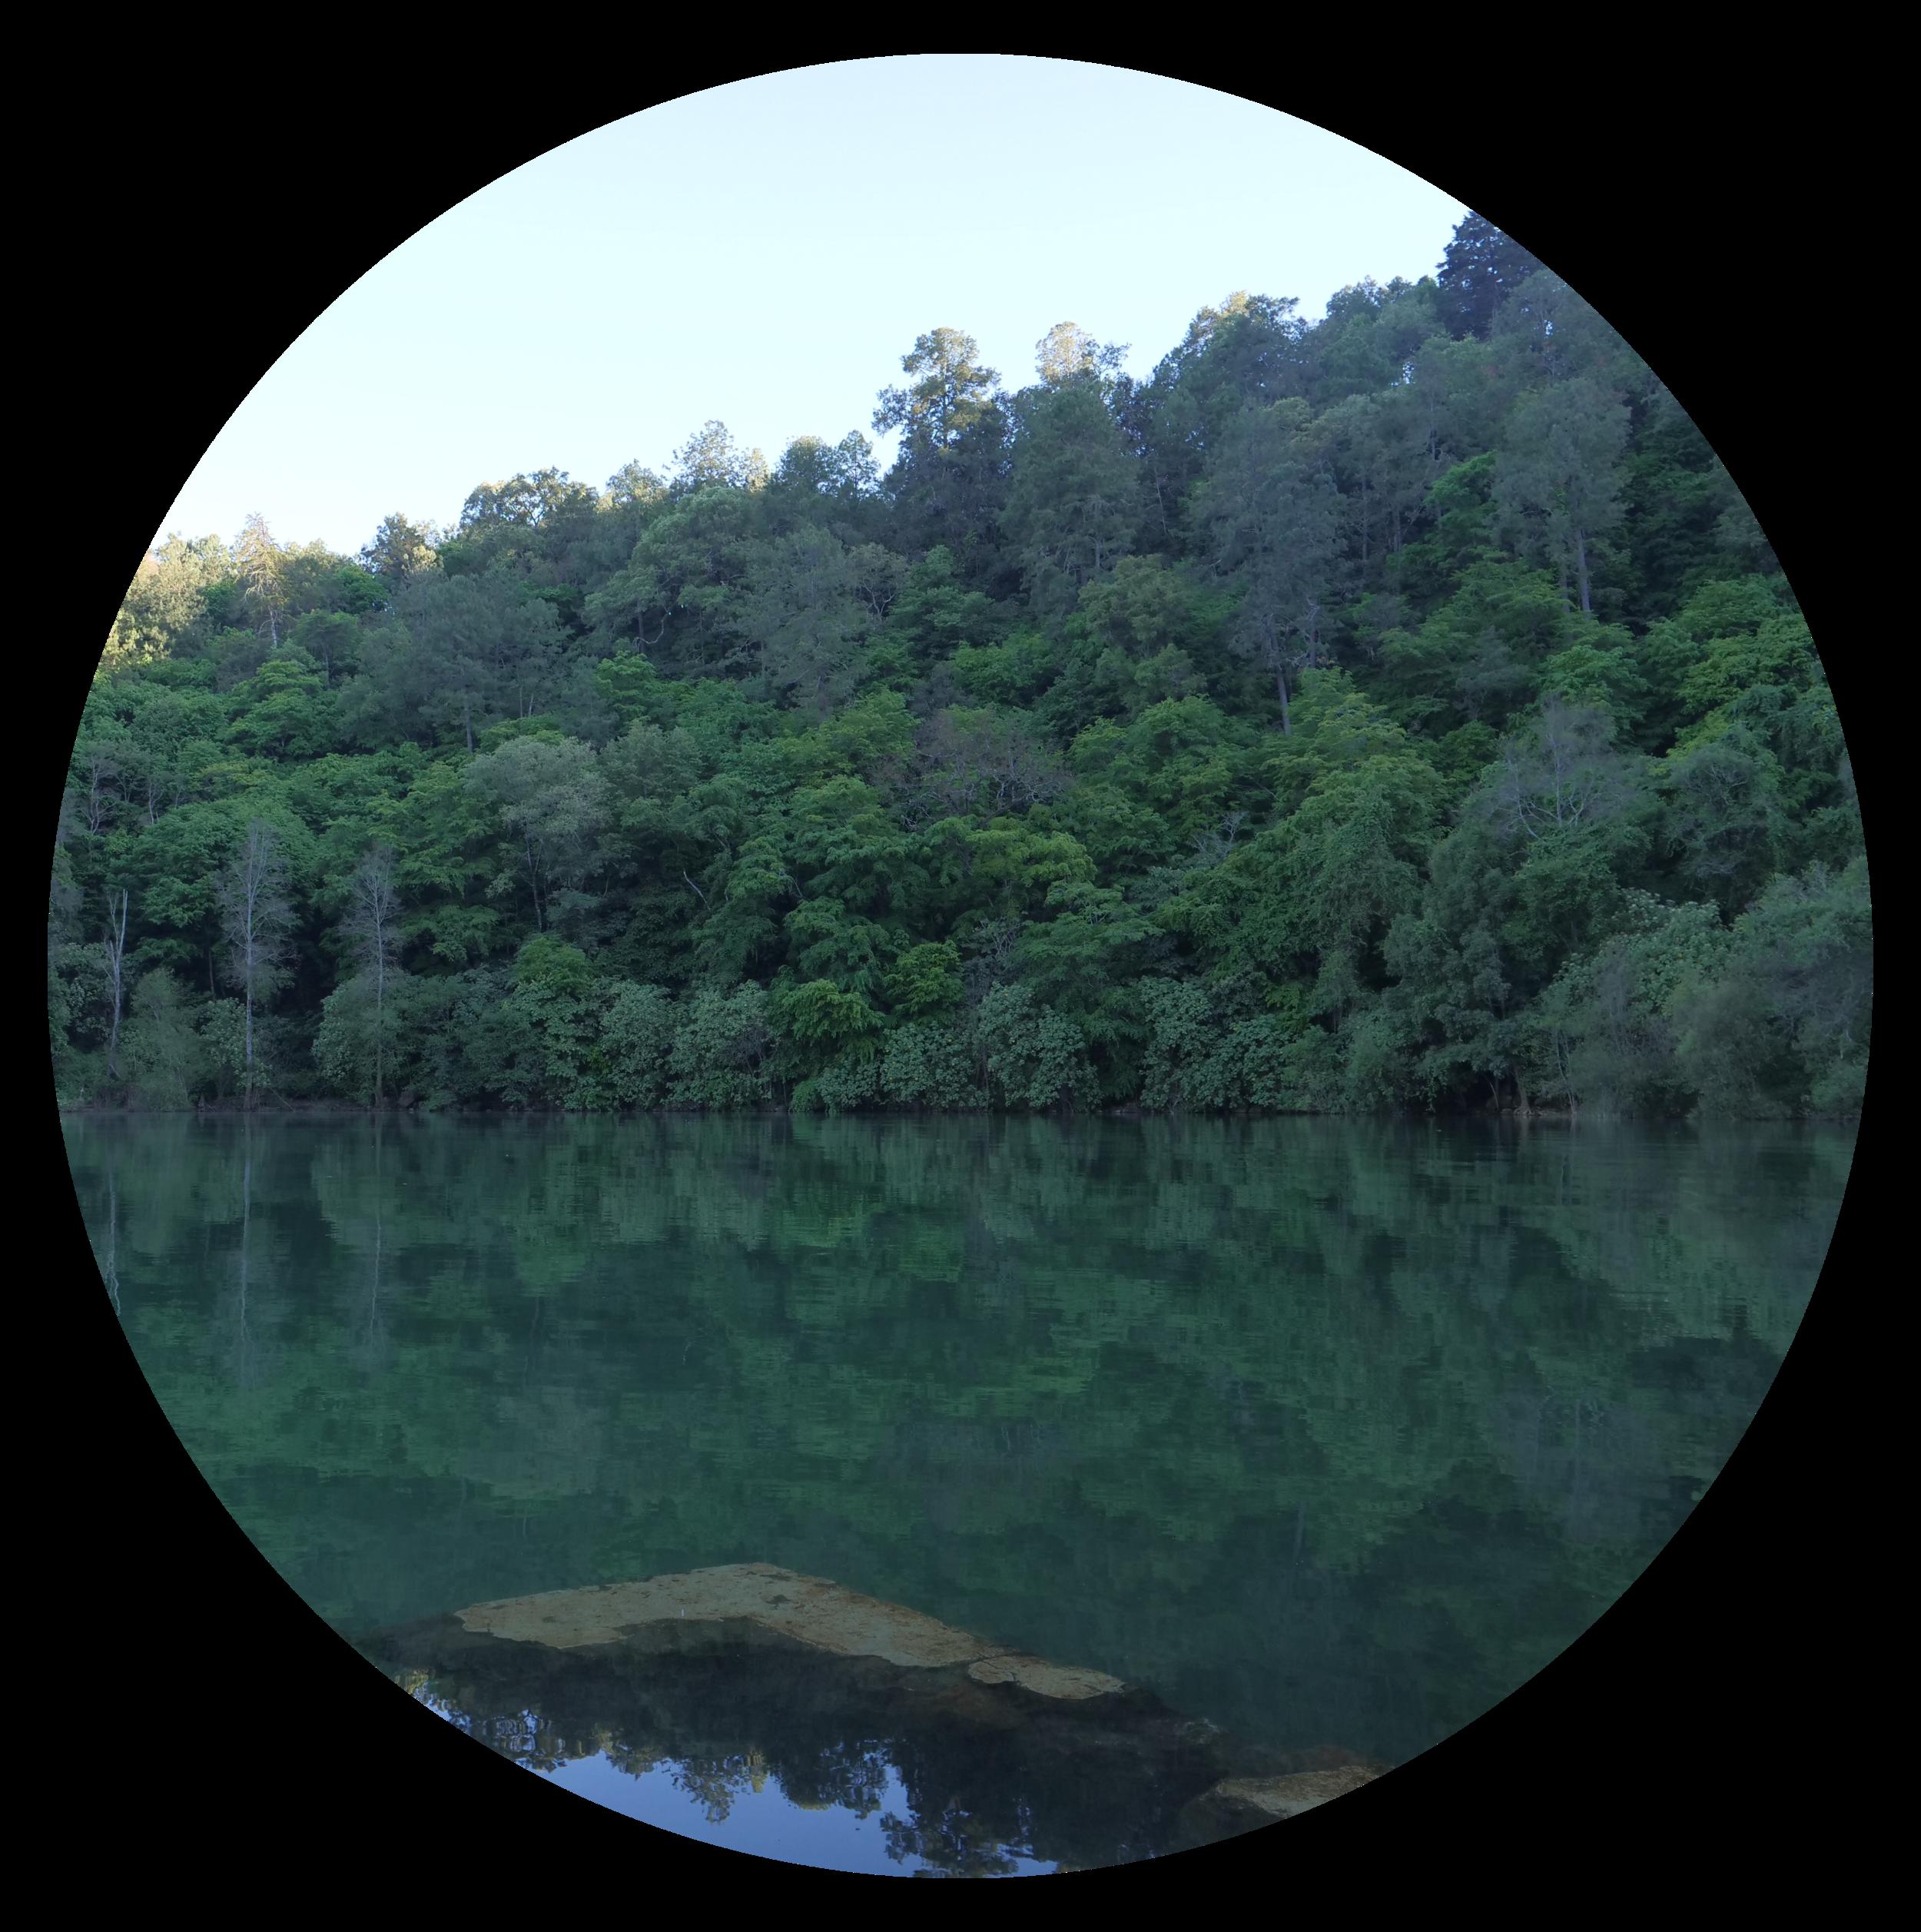 P lago.png